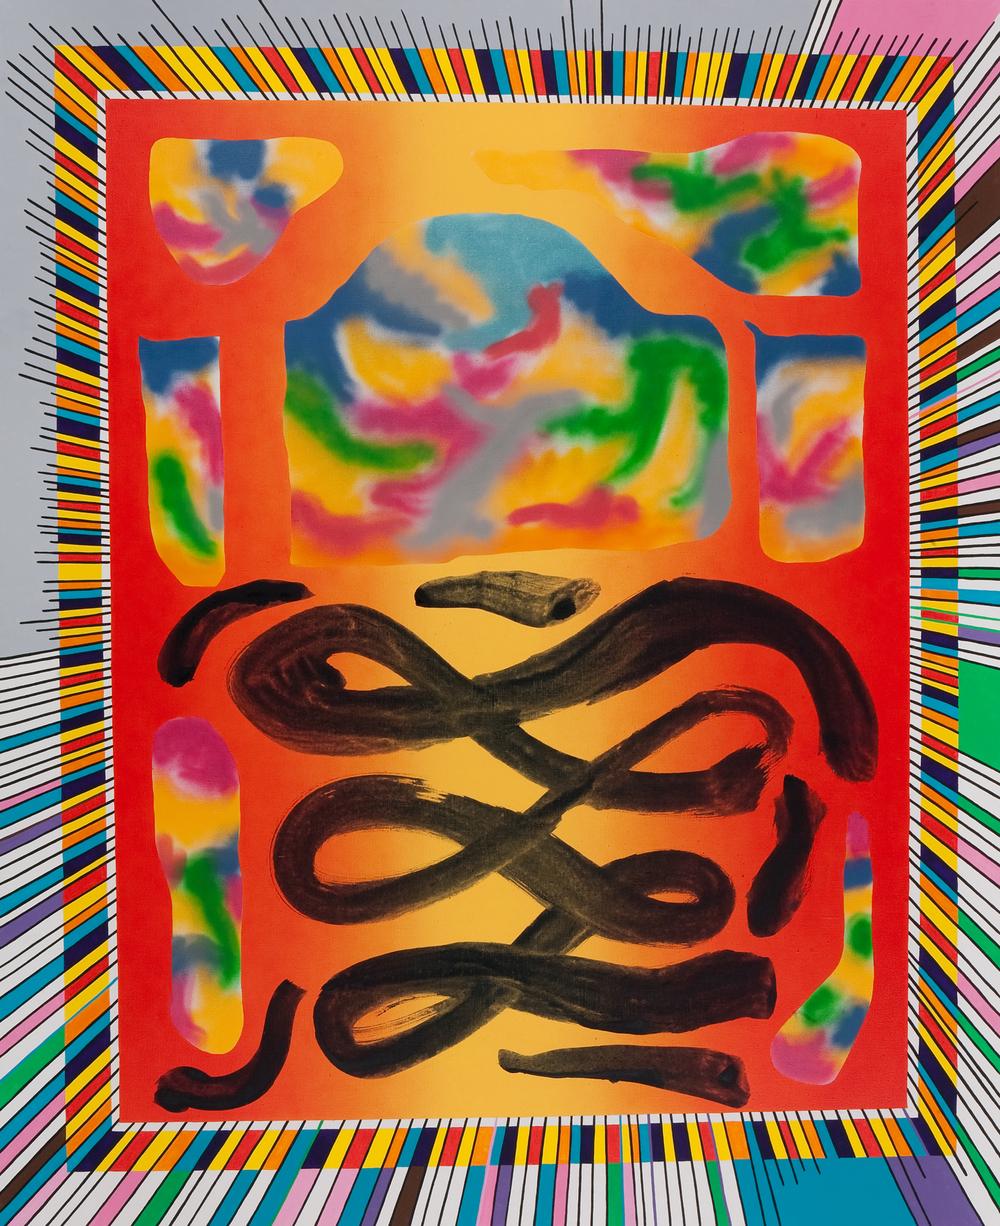 Speed Of Light, 2009, acrylic, spray on canvas, 240 x 190 cm